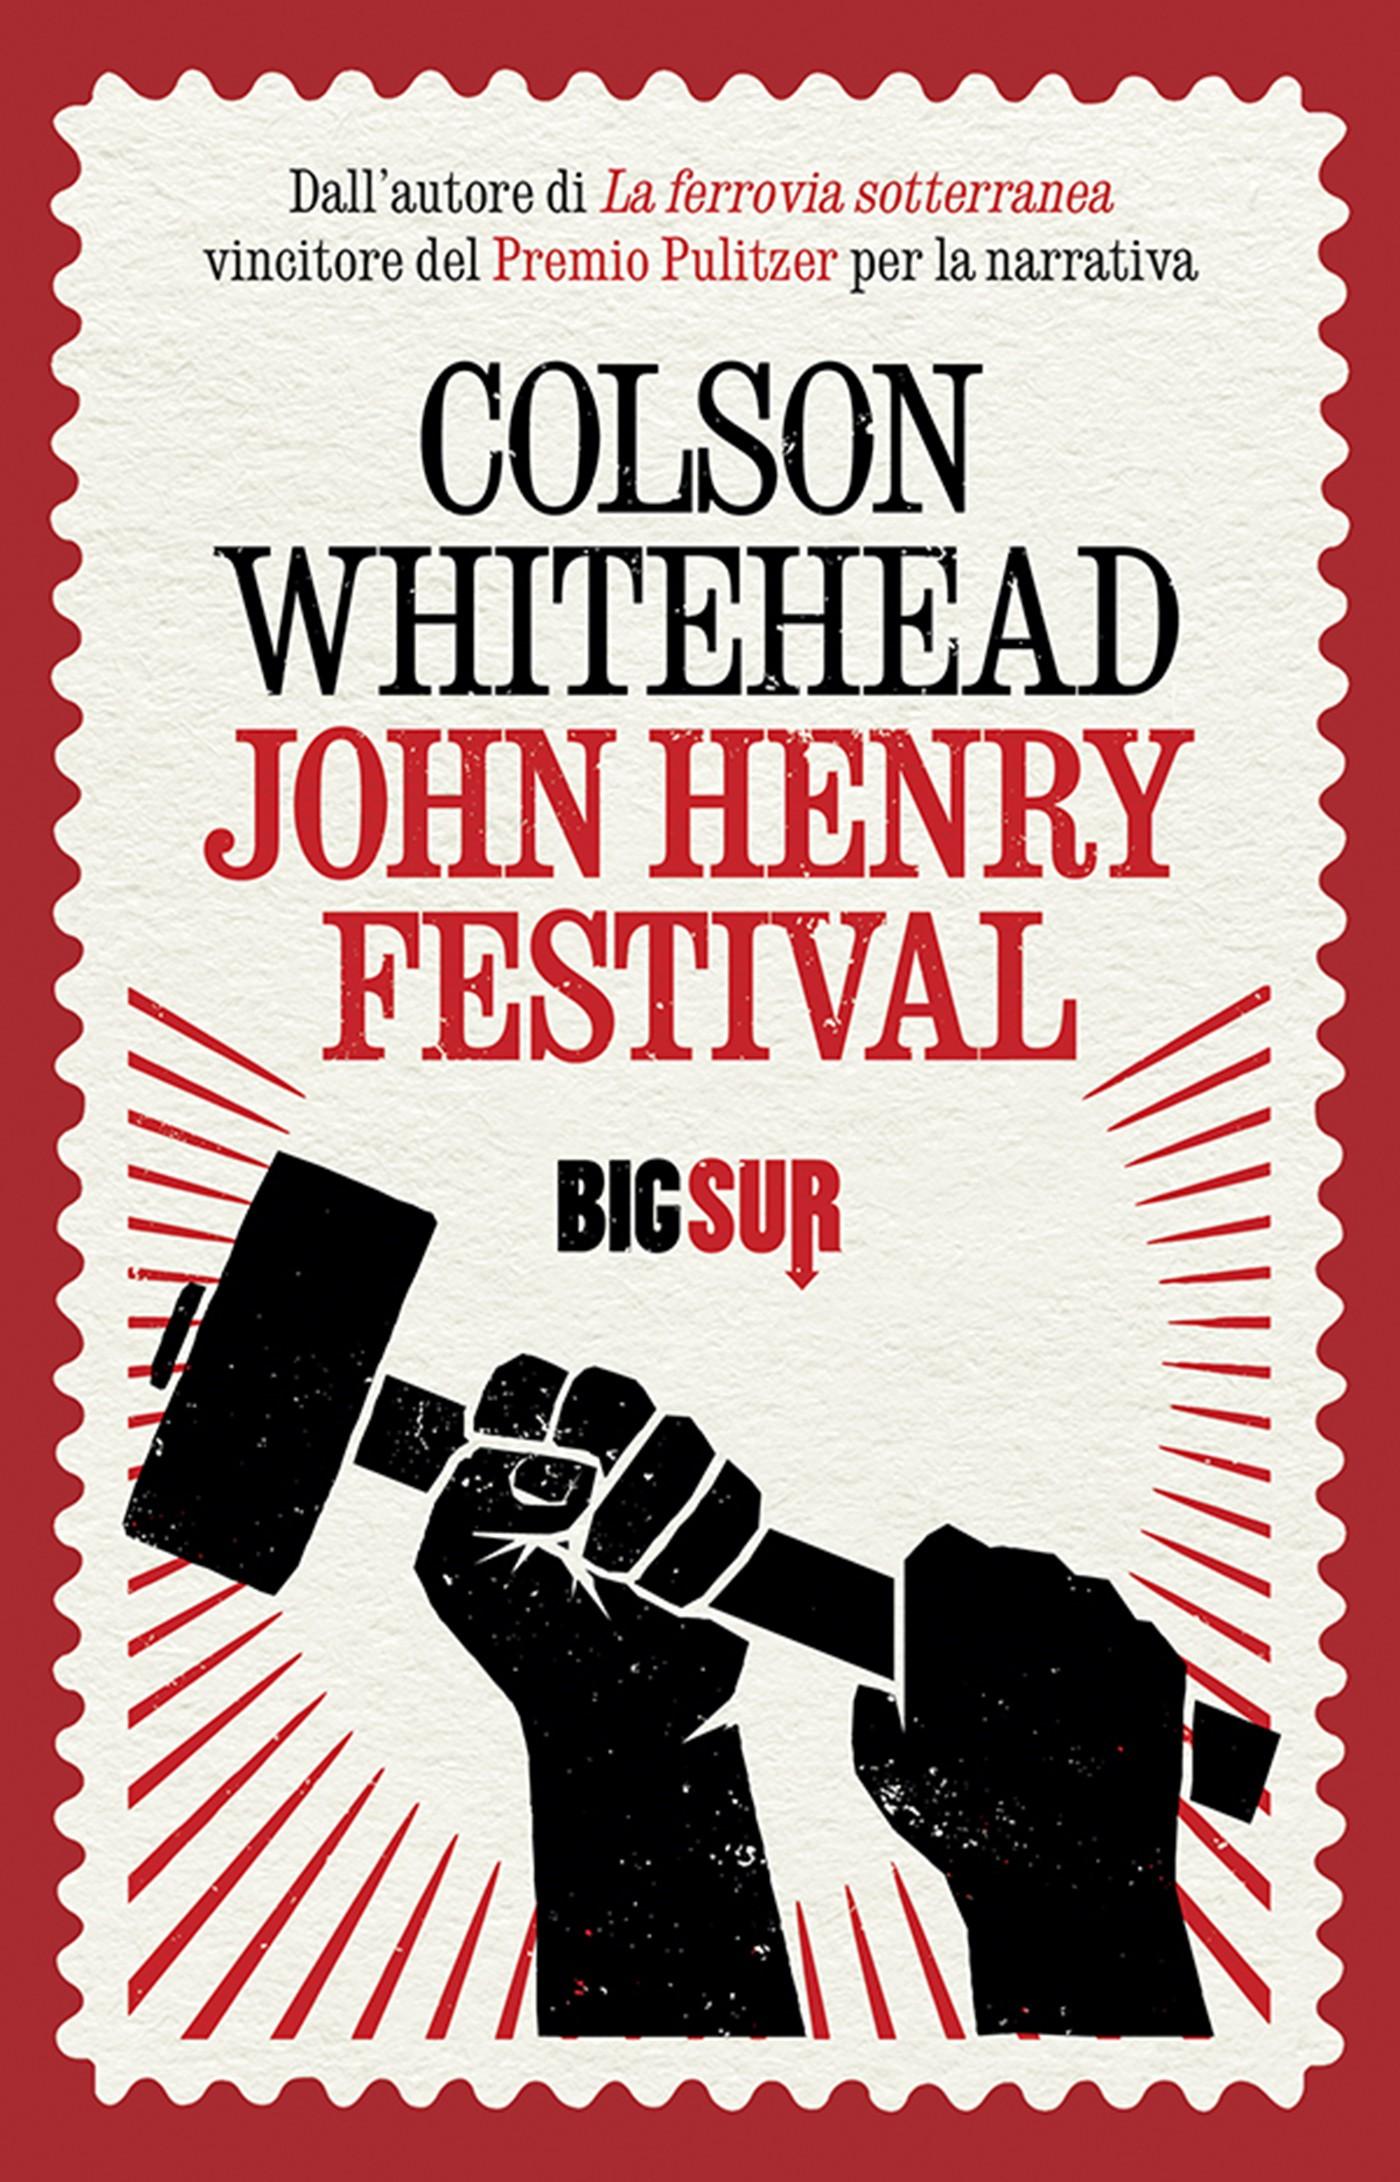 Book Cover Images Api : John henry festival colson whitehead ebook bookrepublic